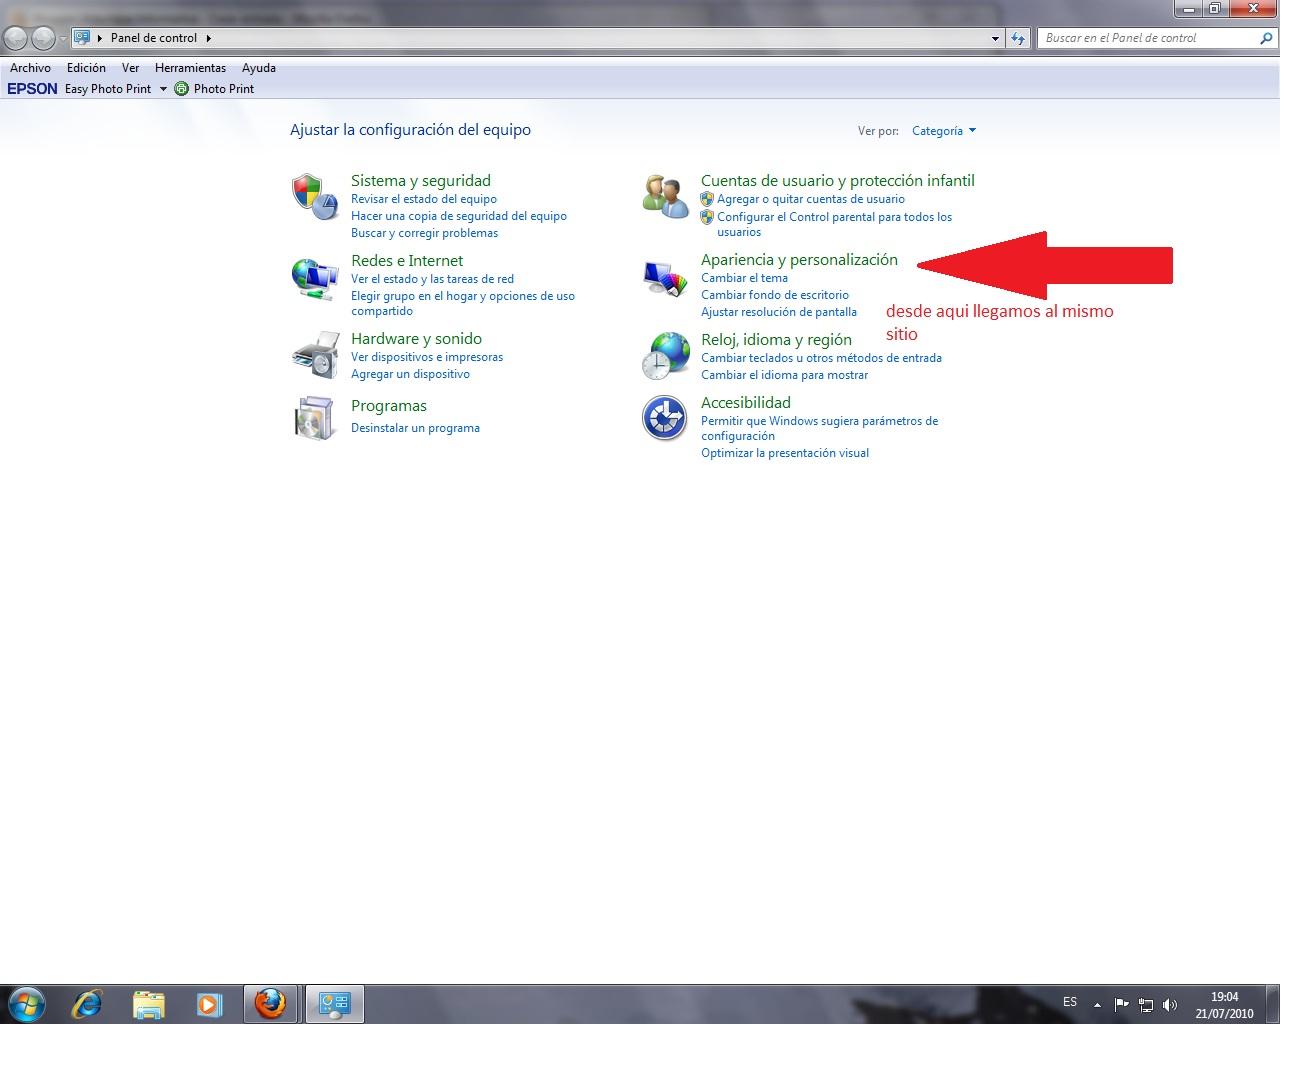 Como cambiar el fondo de pantalla - Como cambiar fondo de escritorio windows 7 starter ...